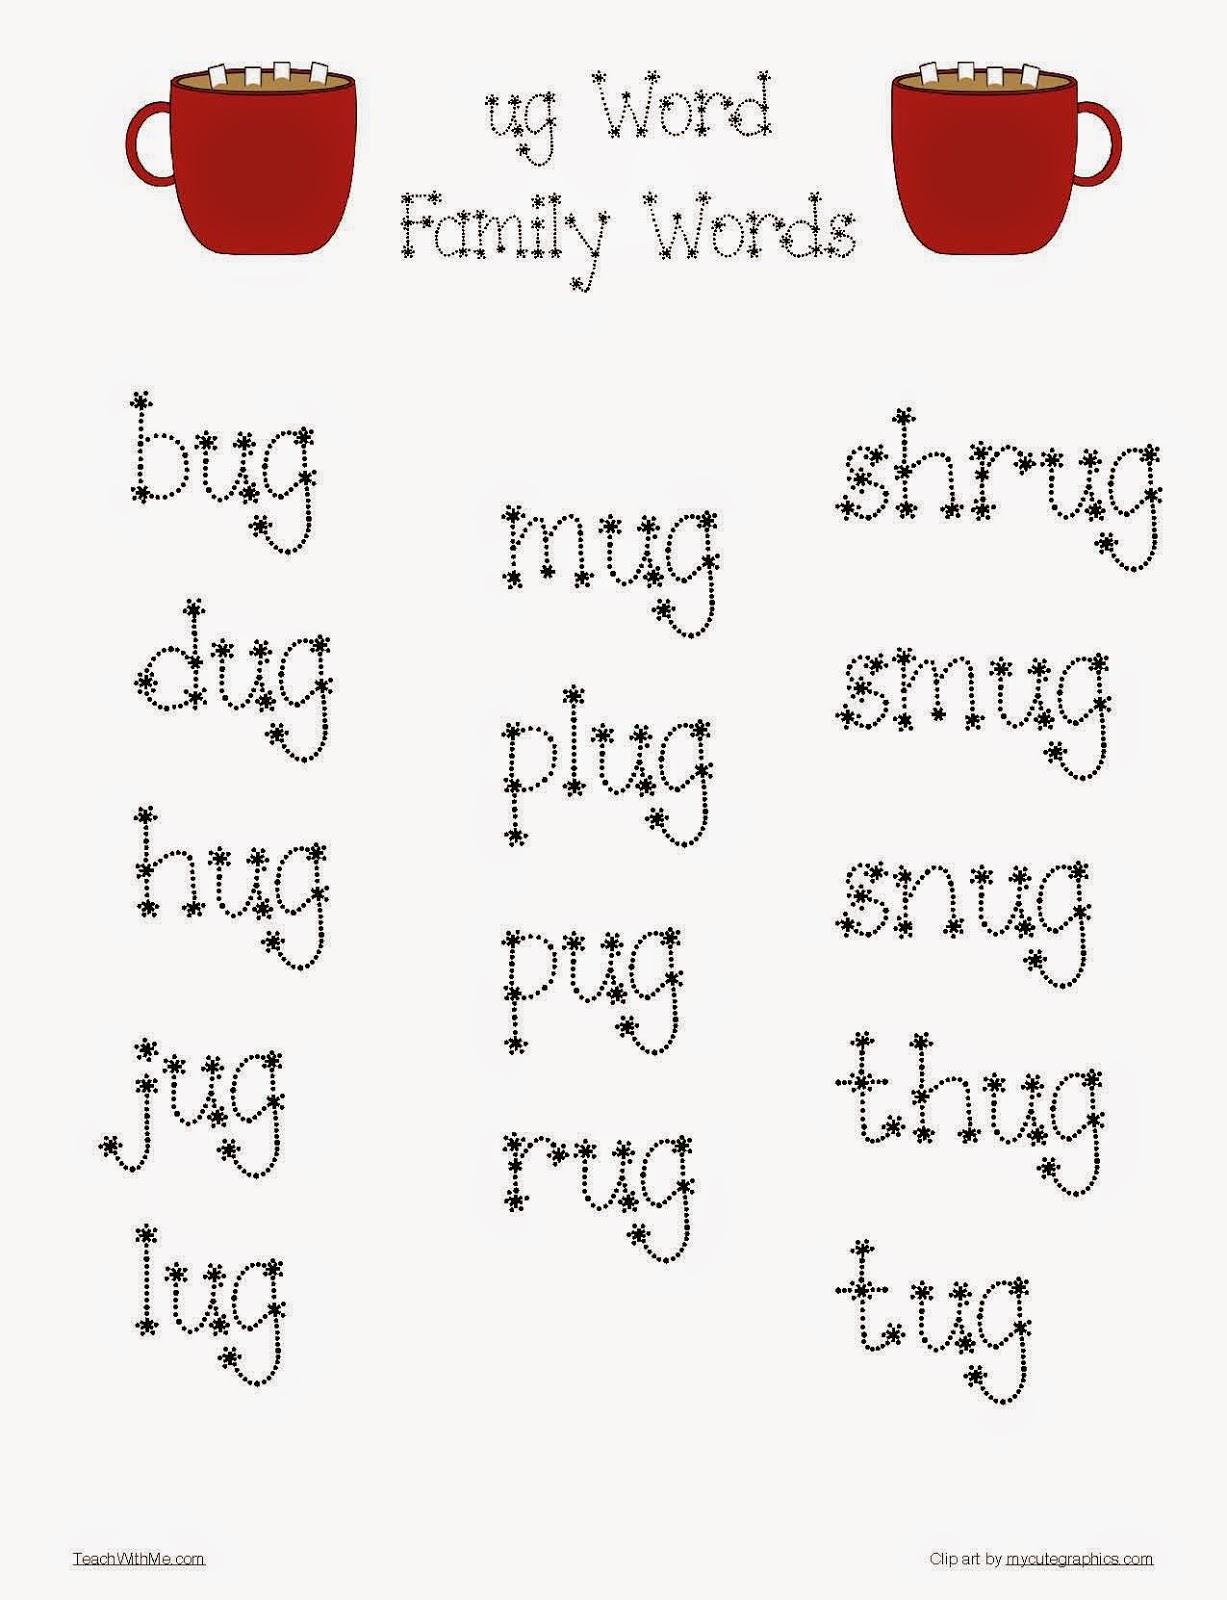 Classroom Freebies: UG Word Family Mug packet